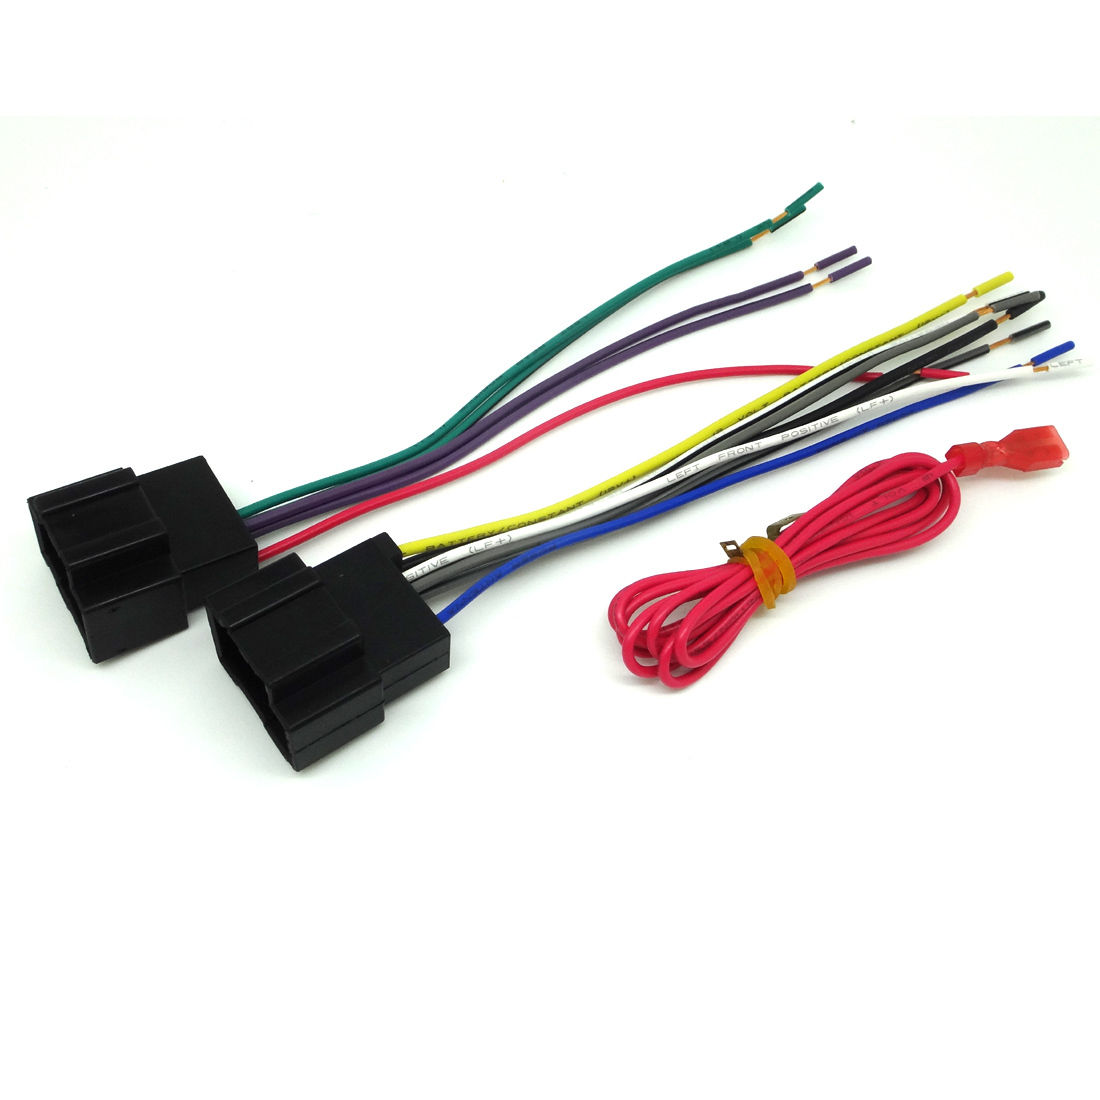 2001 gmc sierra stereo wiring diagram perko dual battery switch 1996 radio 32